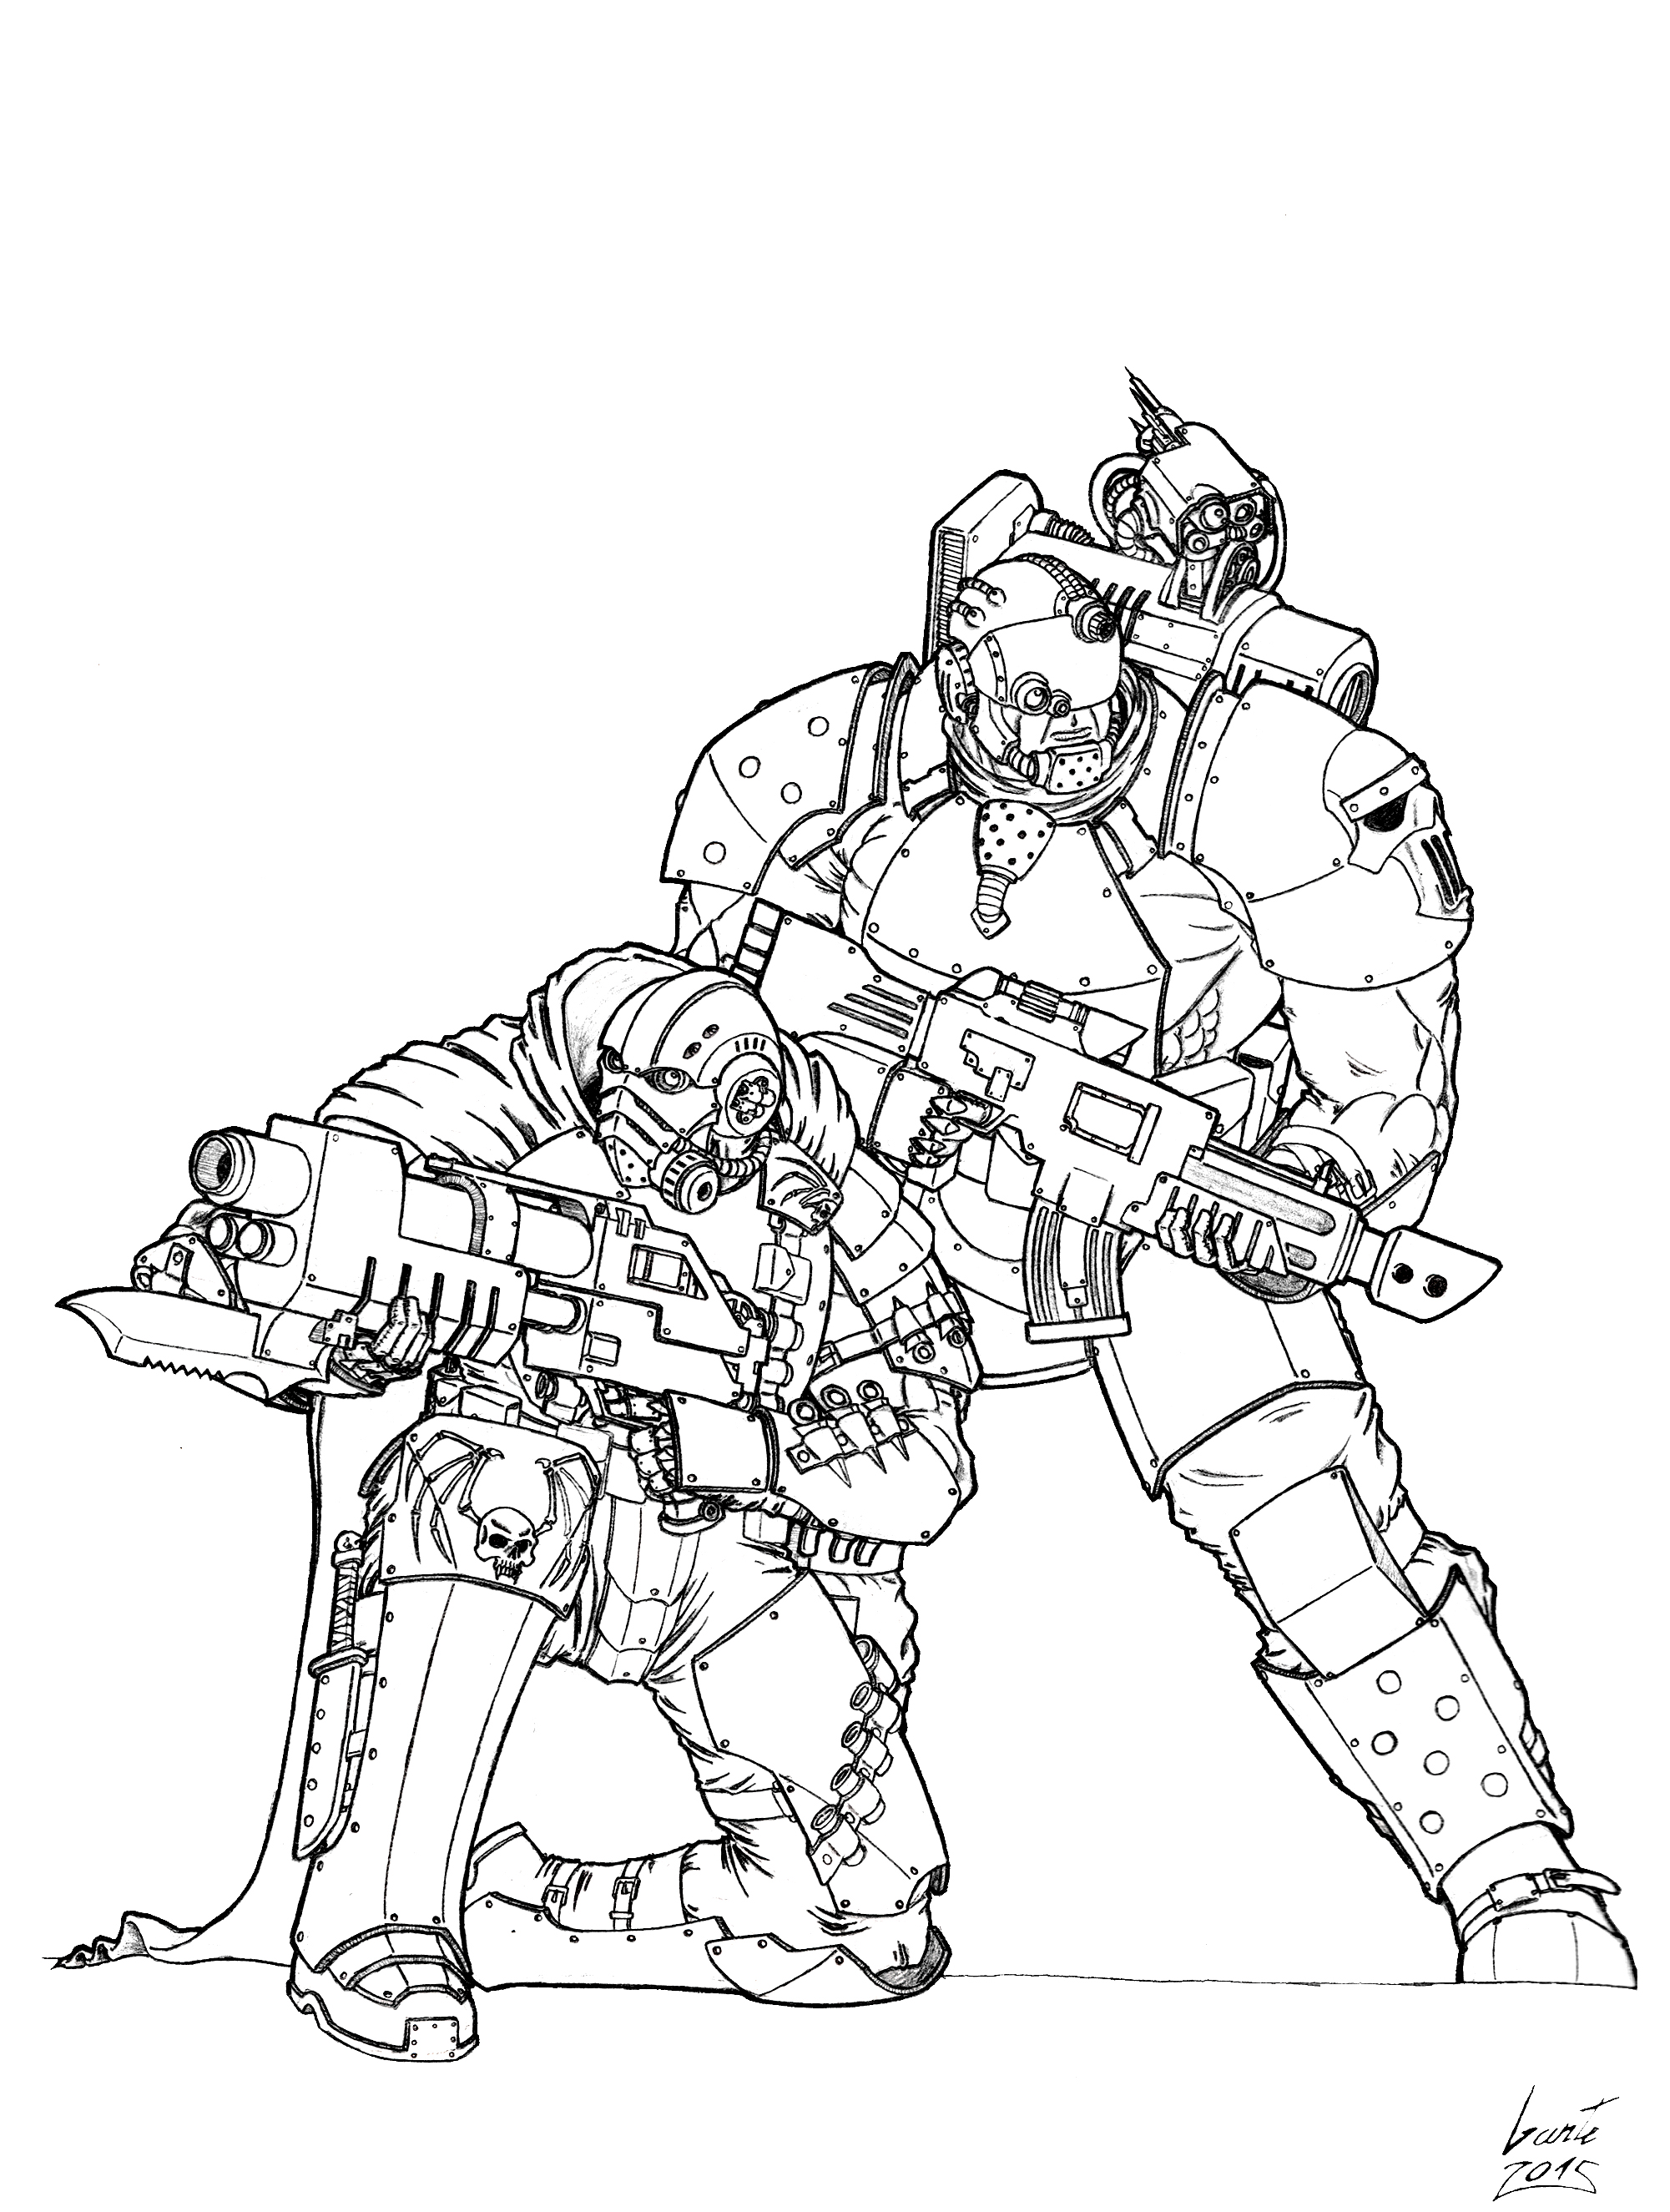 Pre-Heresy Recon Marines by Greyall